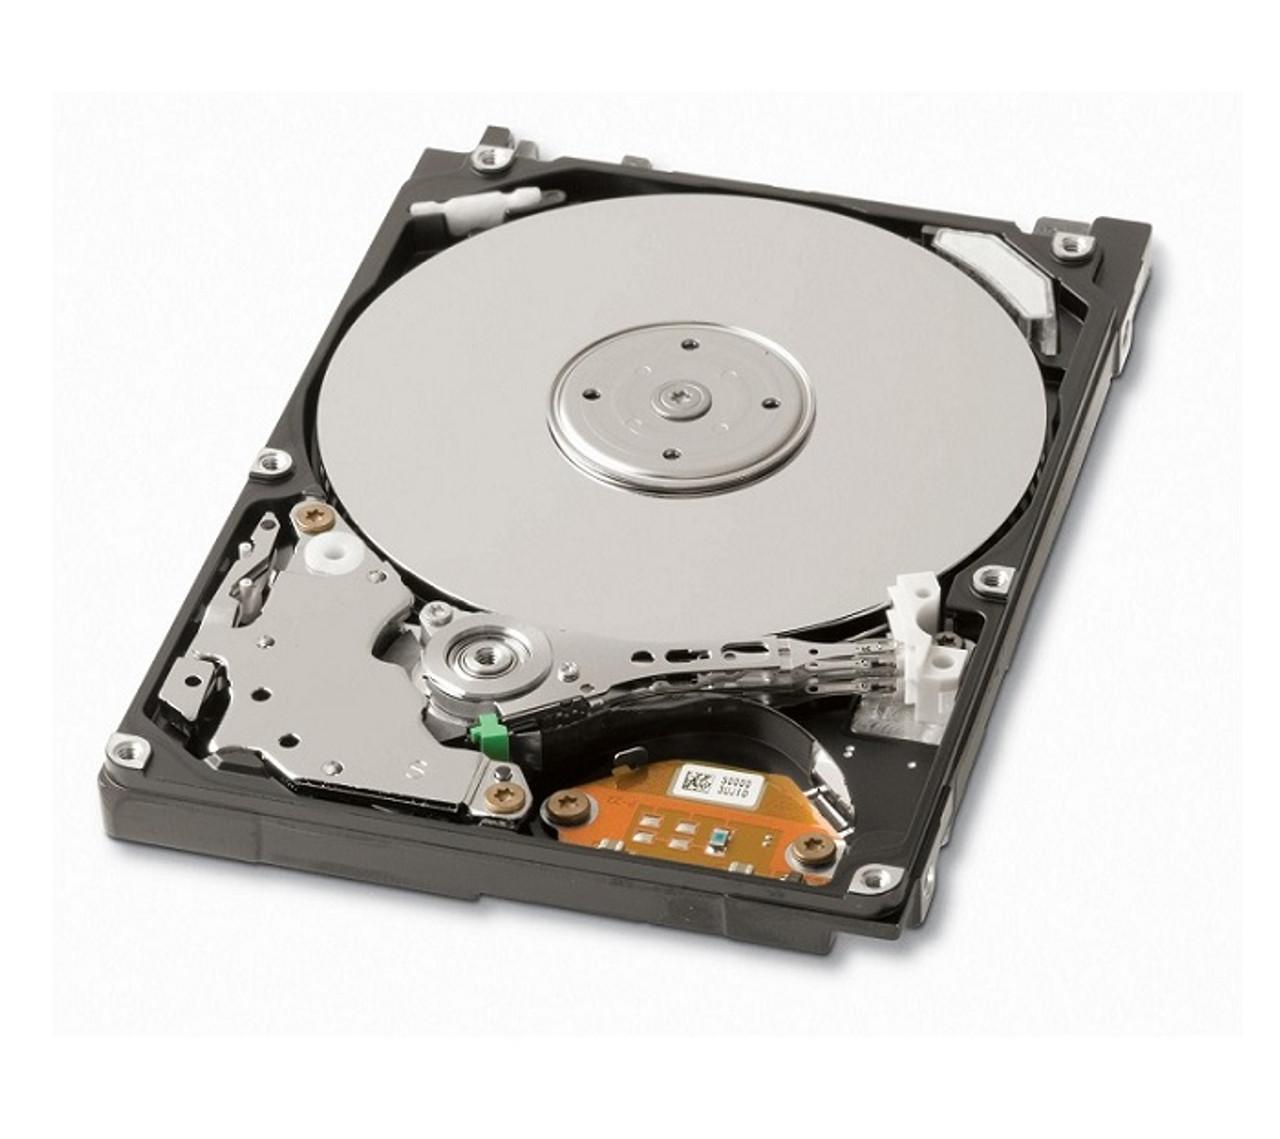 0S02598 - Hitachi IDK Travelstar 500GB 5400RPM SATA 3GB/s 8MB Cache 2.5-inch Hard Disk Drive